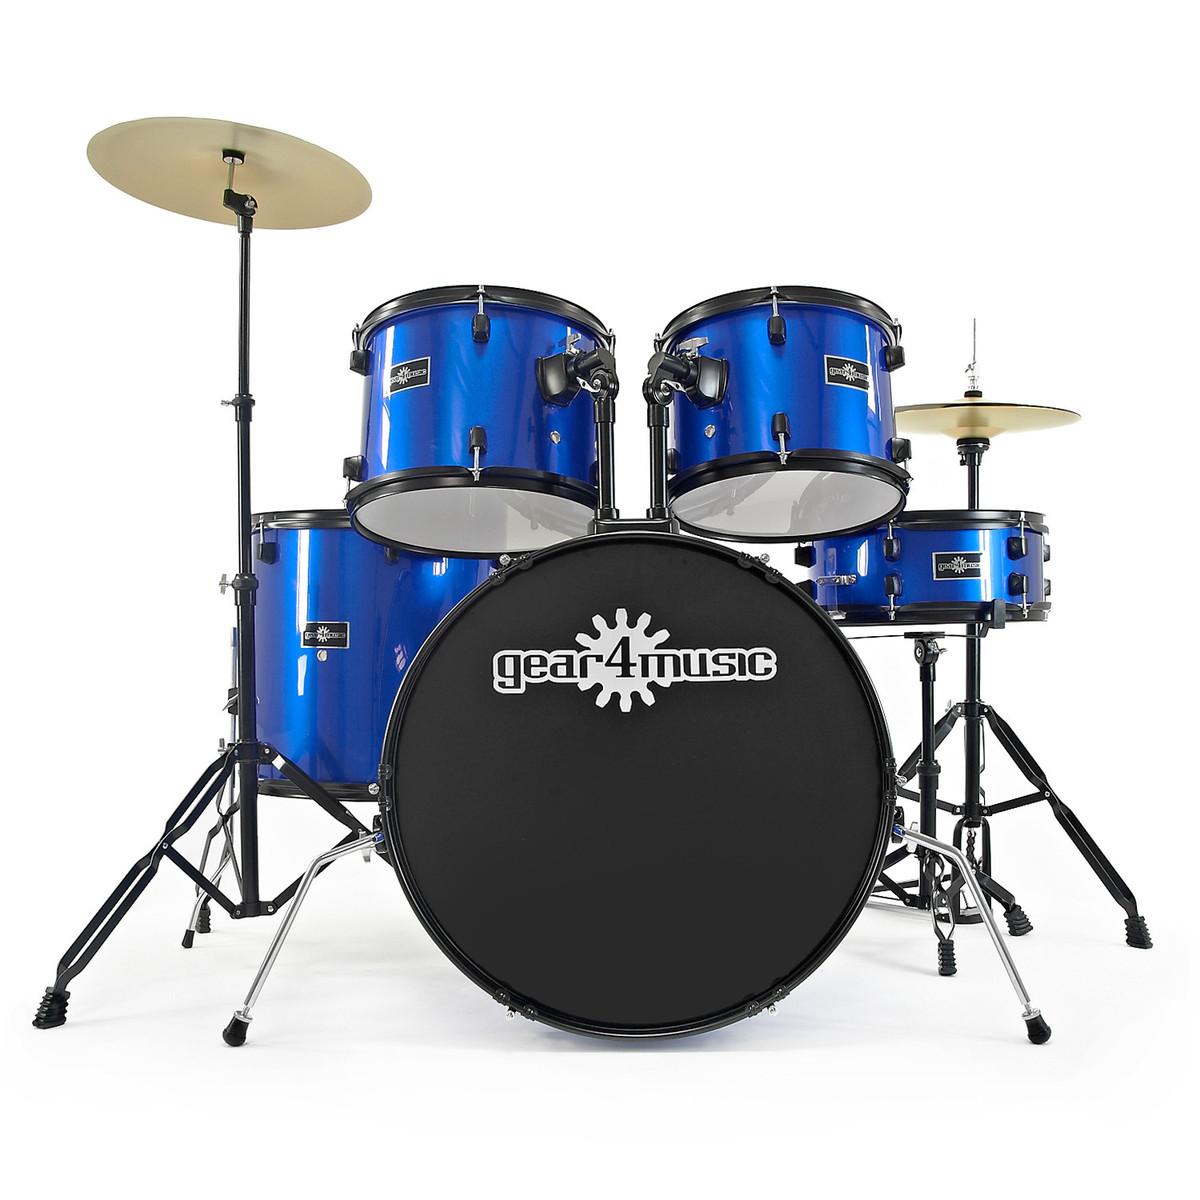 bdk 1 full size starter drum kit by gear4music blue b stock at. Black Bedroom Furniture Sets. Home Design Ideas